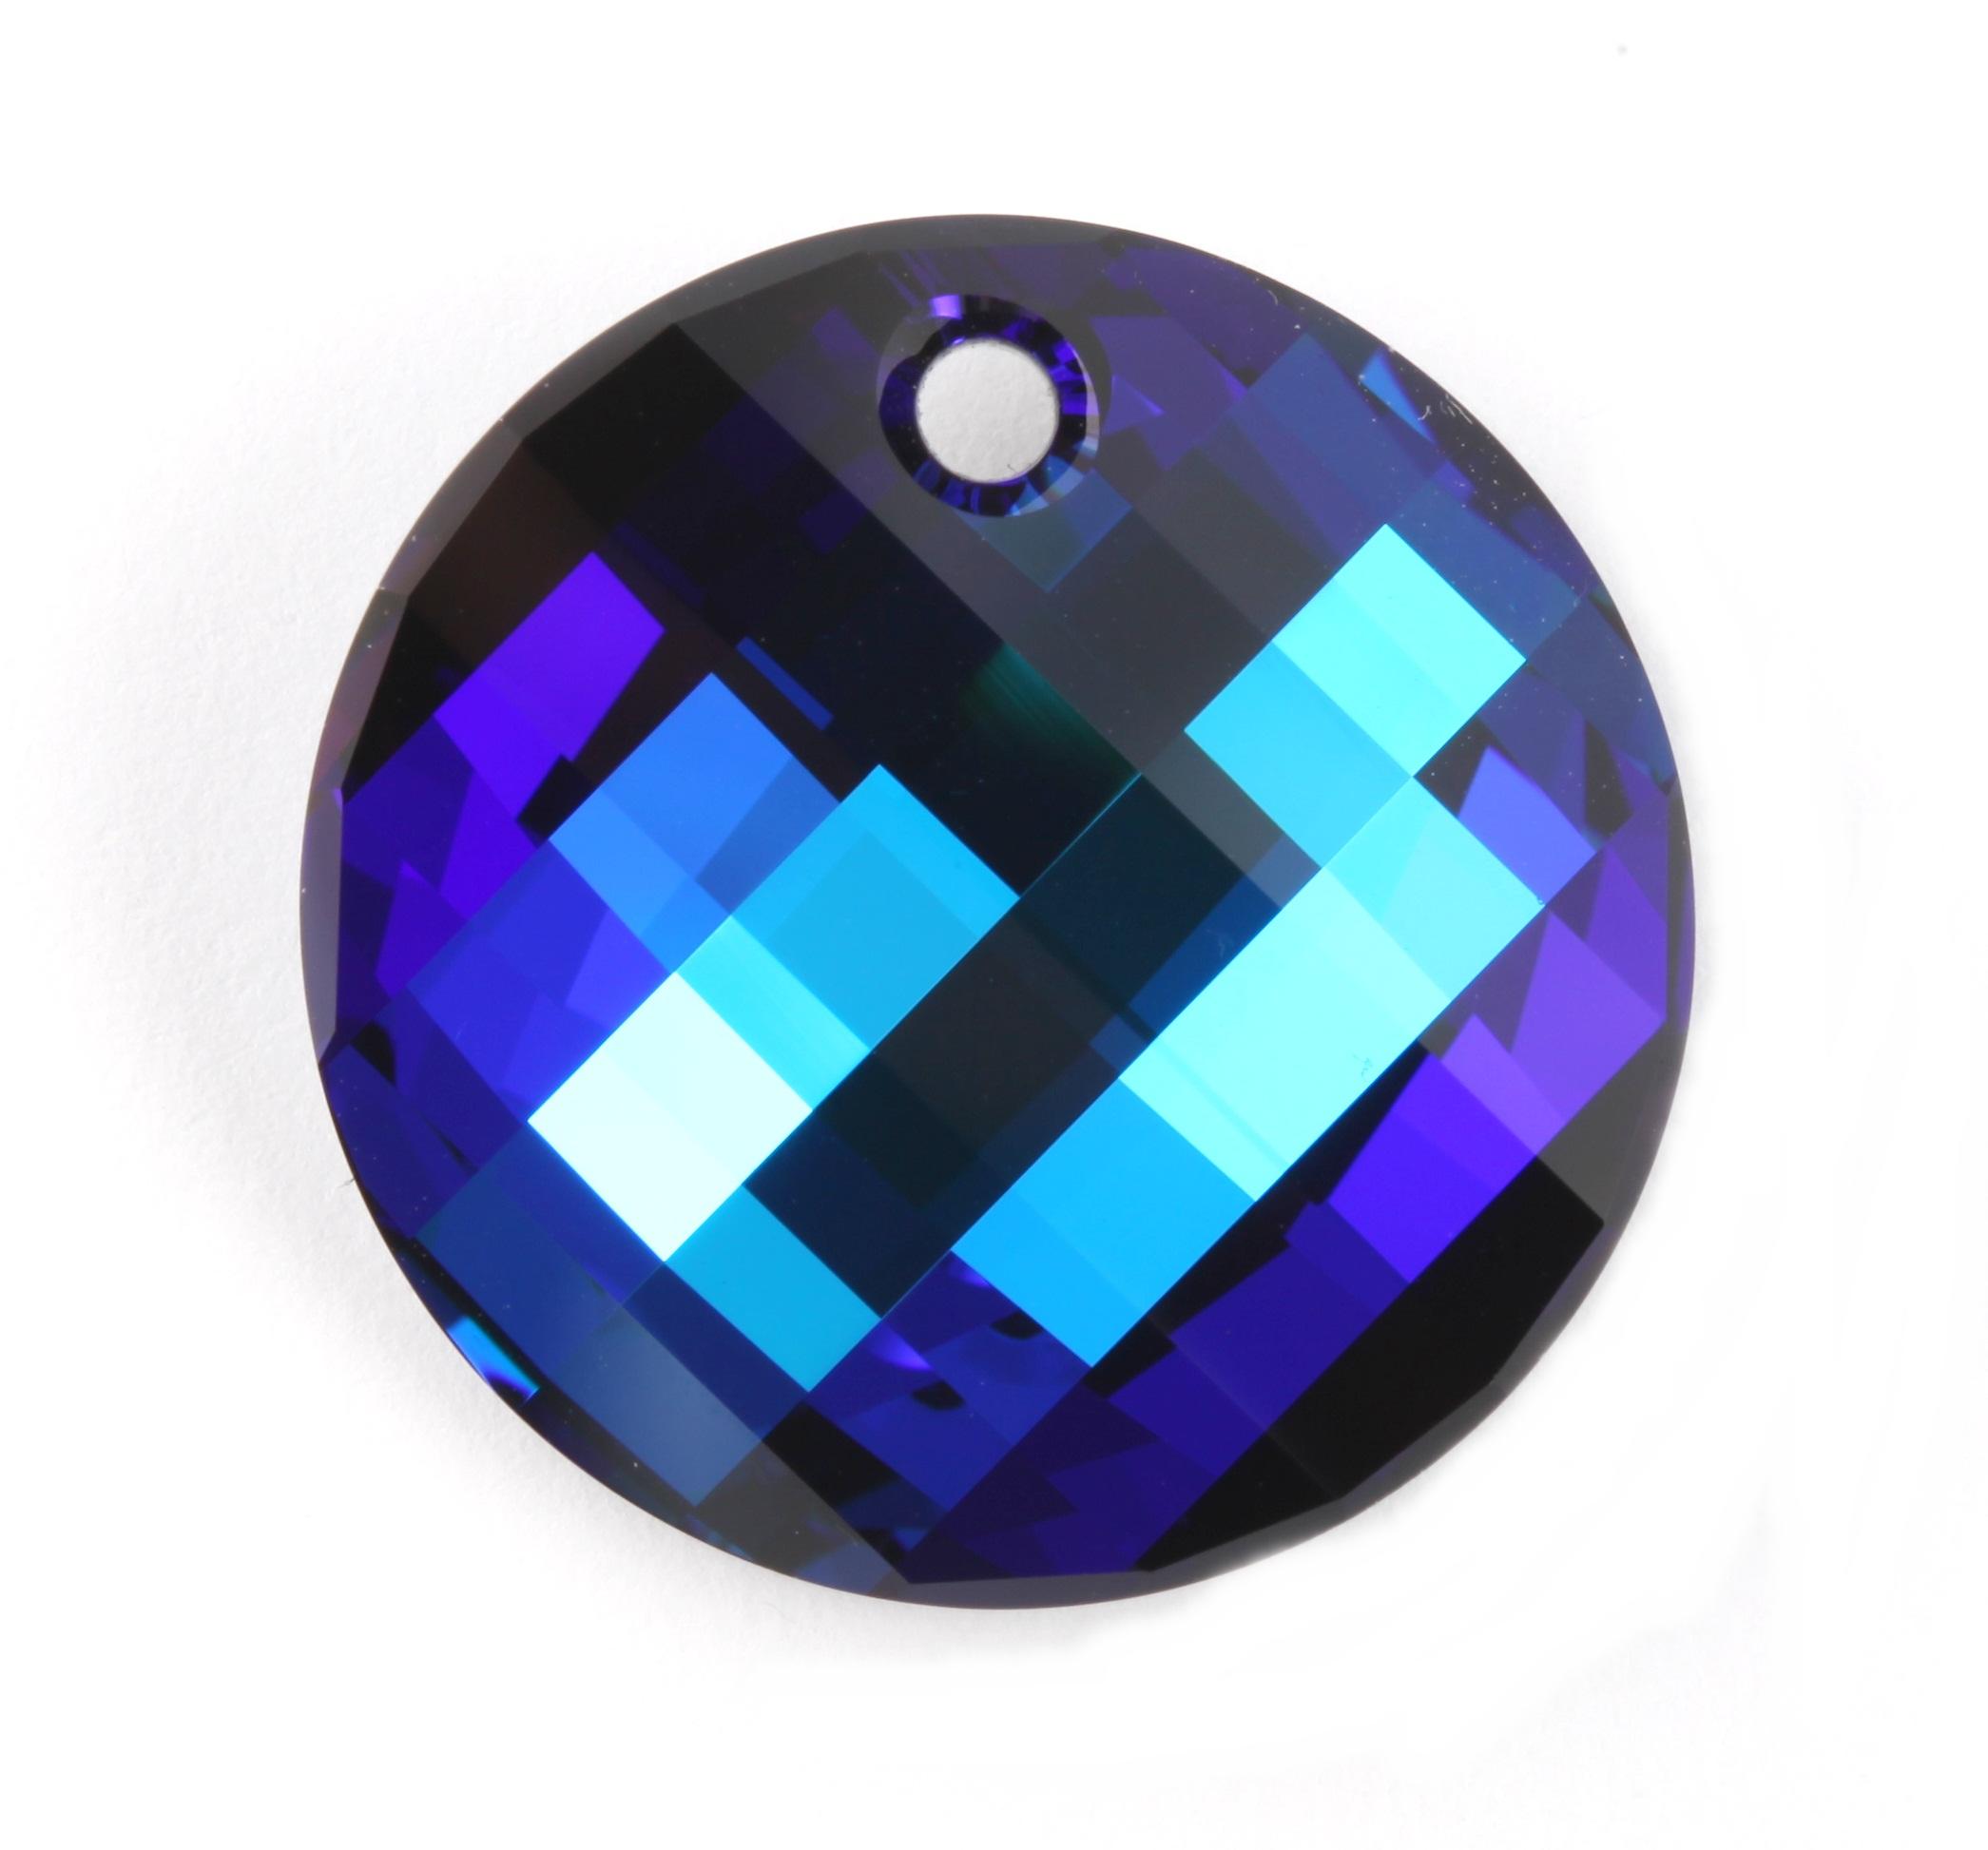 Komponenty Swarovski Elements - novinky. Komponenty Swarovski - přívěsek  Baroko Light Amethyst AB Komponenty Swarovski - Twist Bermuda Blue c146a603614